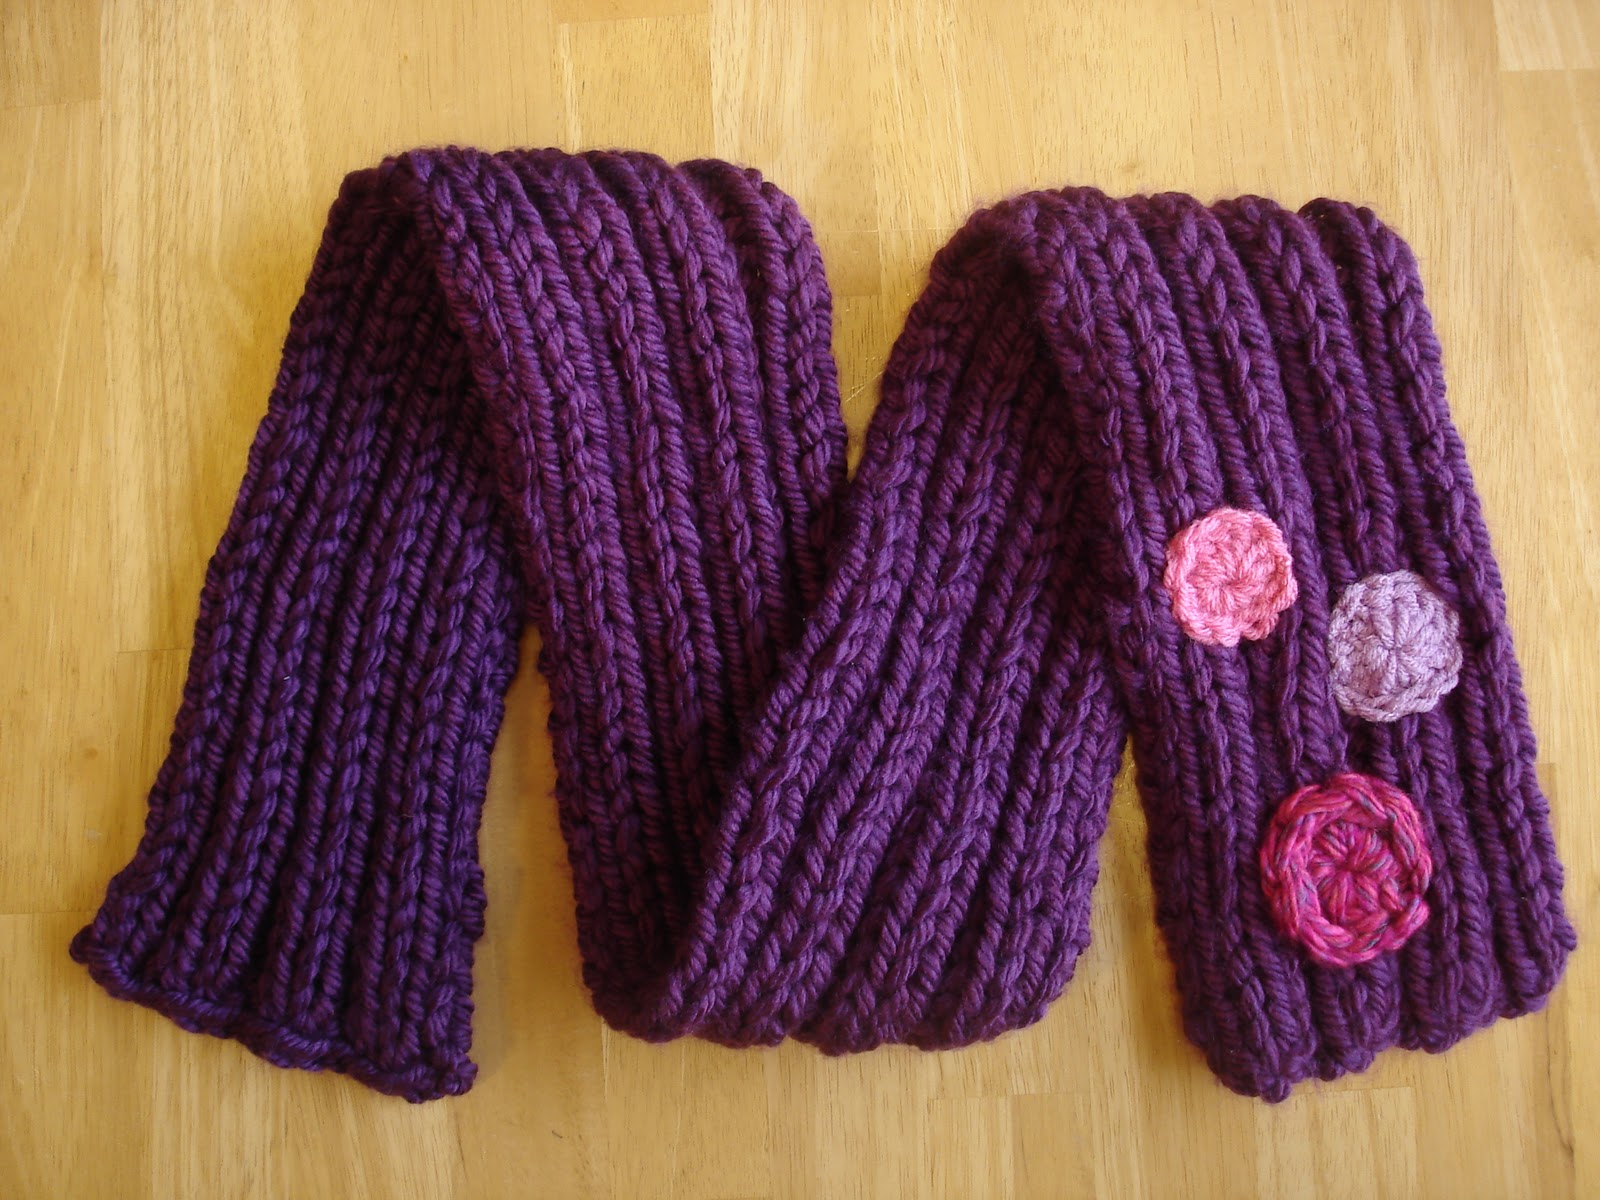 Free Knitting Pattern Her Royal Highness Scarf